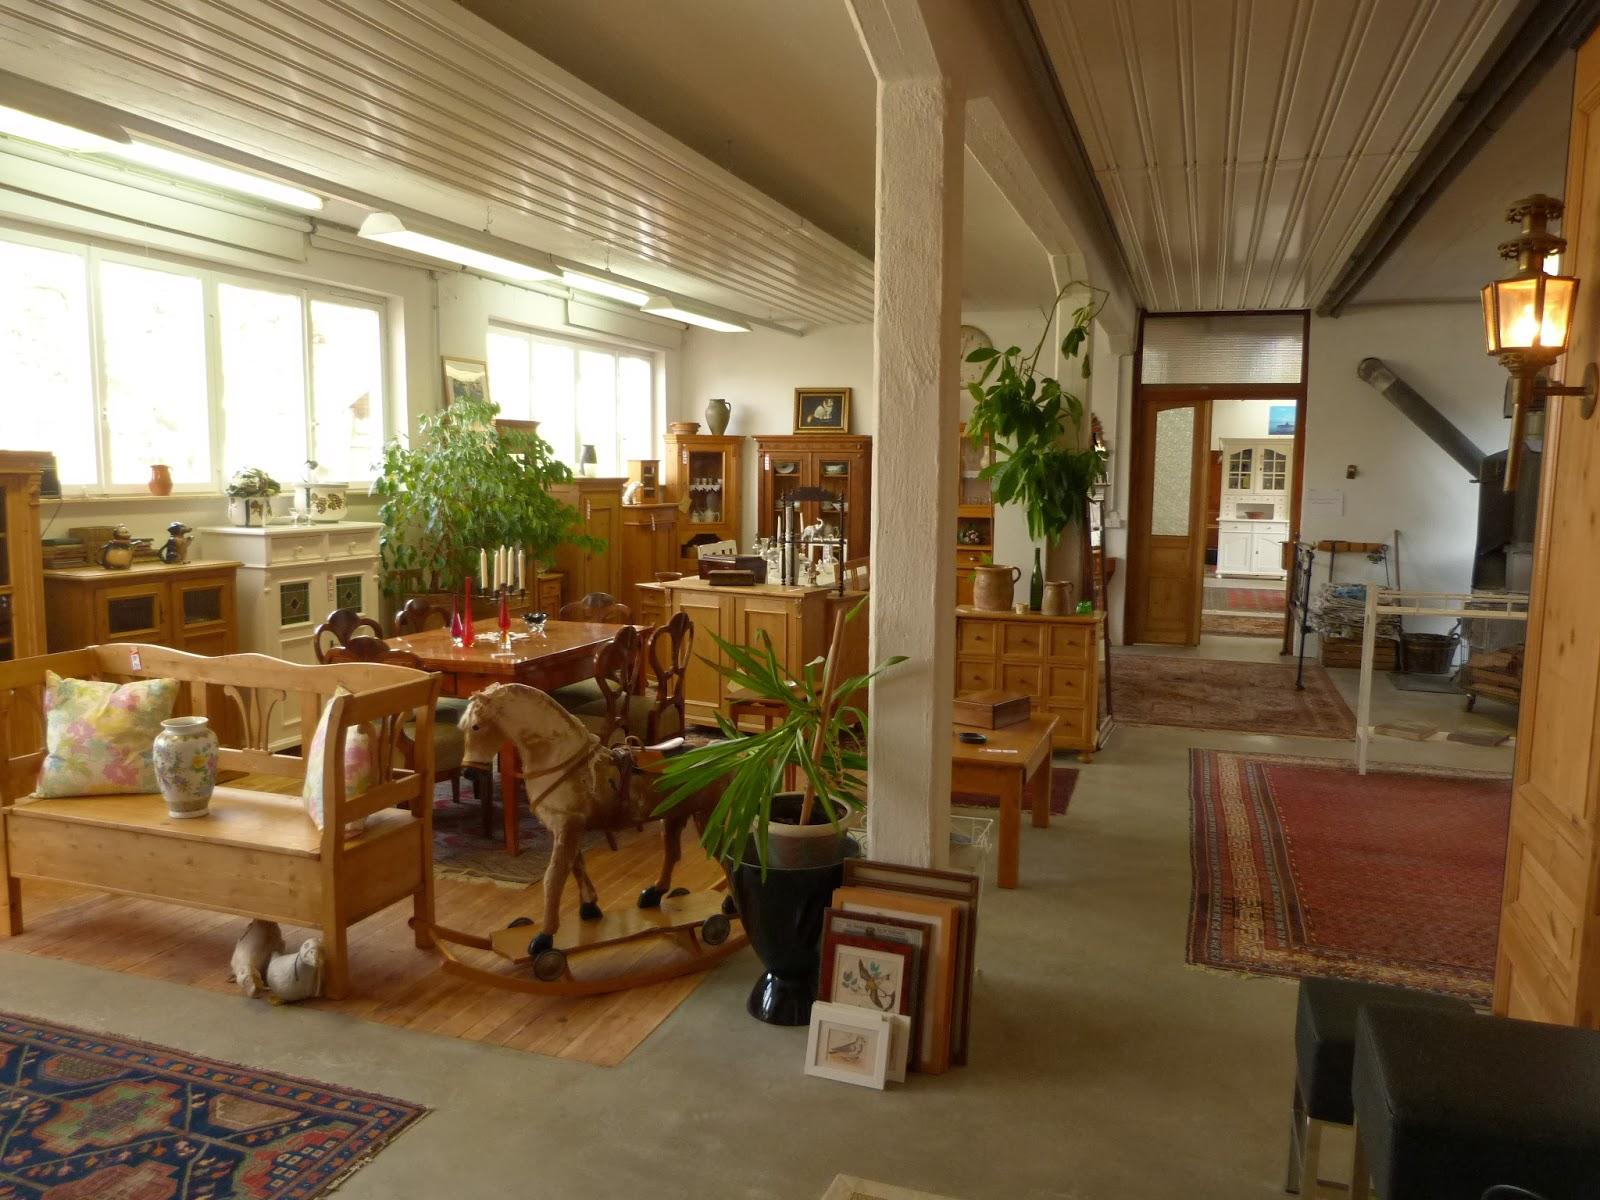 antike m bel unsere neuen gesch ftsr ume in kirchheim am. Black Bedroom Furniture Sets. Home Design Ideas